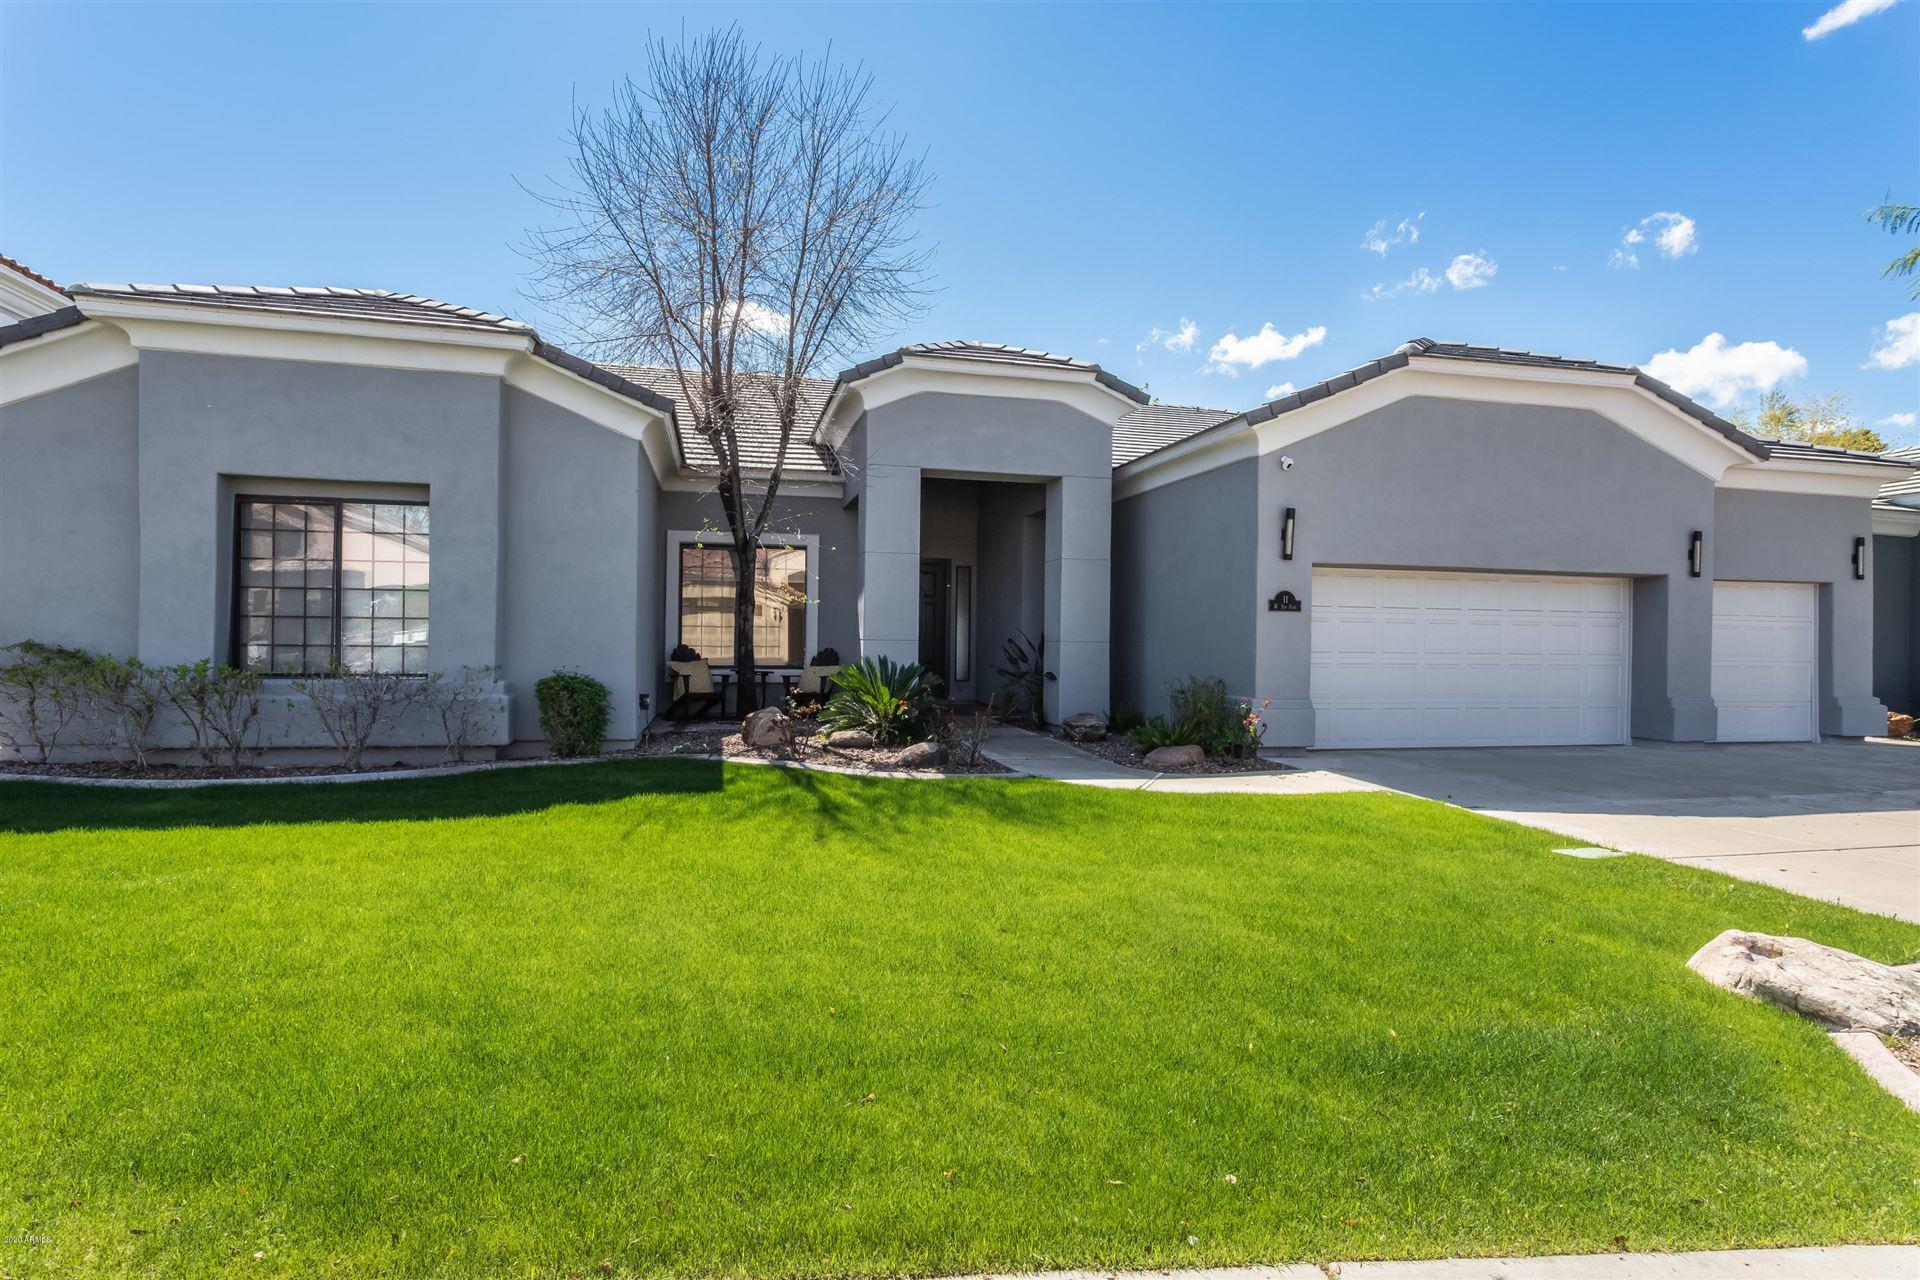 Property Image Of 11 W San Juan Avenue In Phoenix, Az